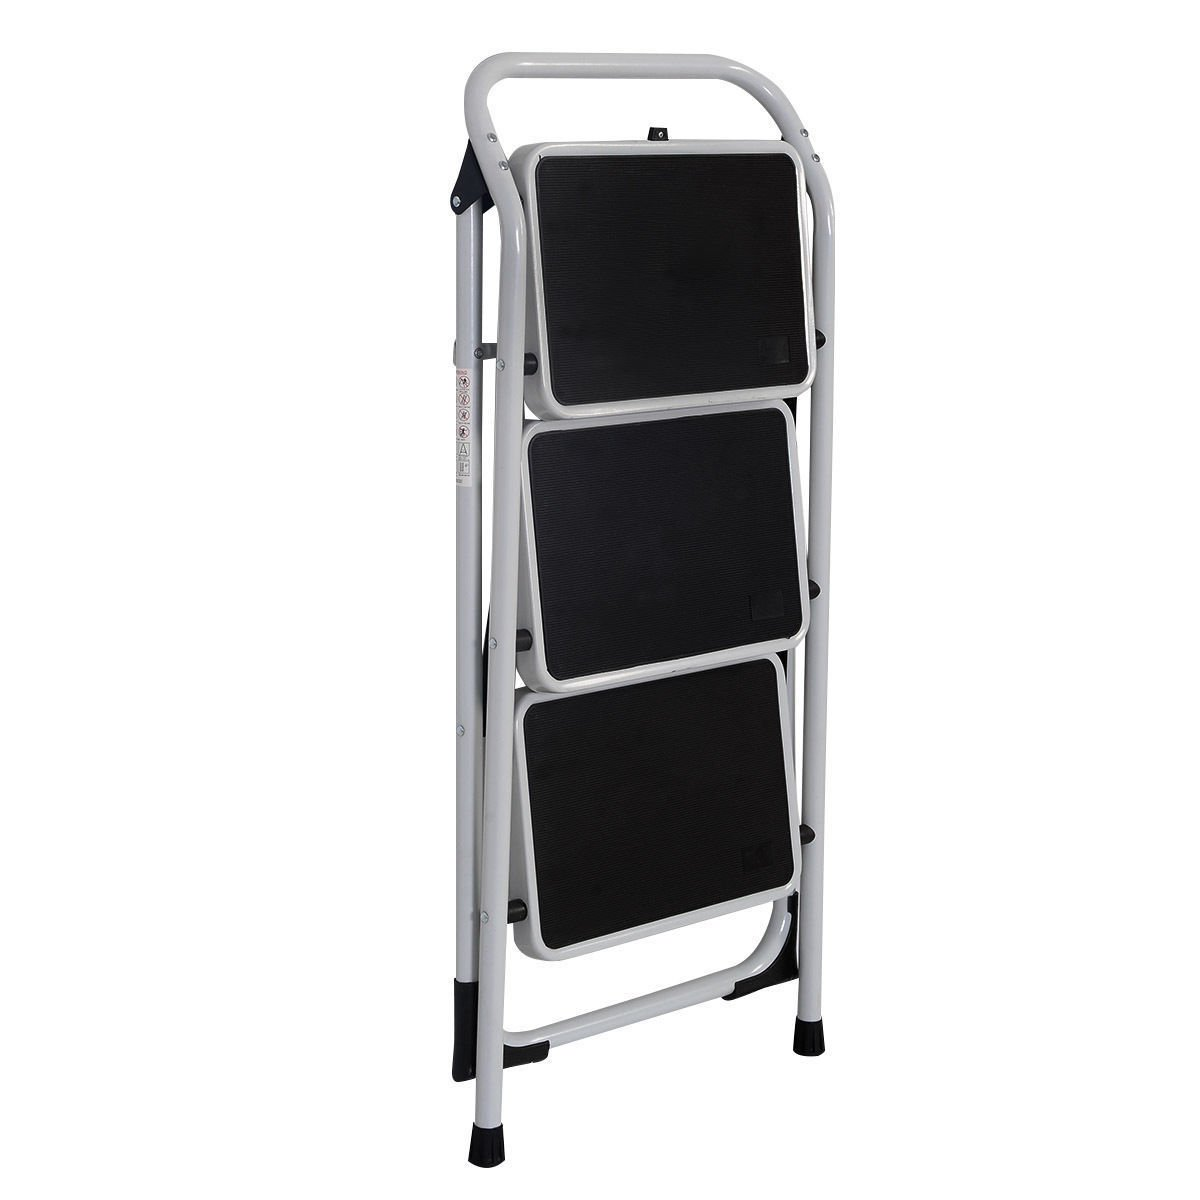 Goplus 3 Step Ladder Folding Heavy Duty Step Stool Anti-slip Platform Sturdy HD Construction, 330lbs Capacity by Goplus (Image #2)